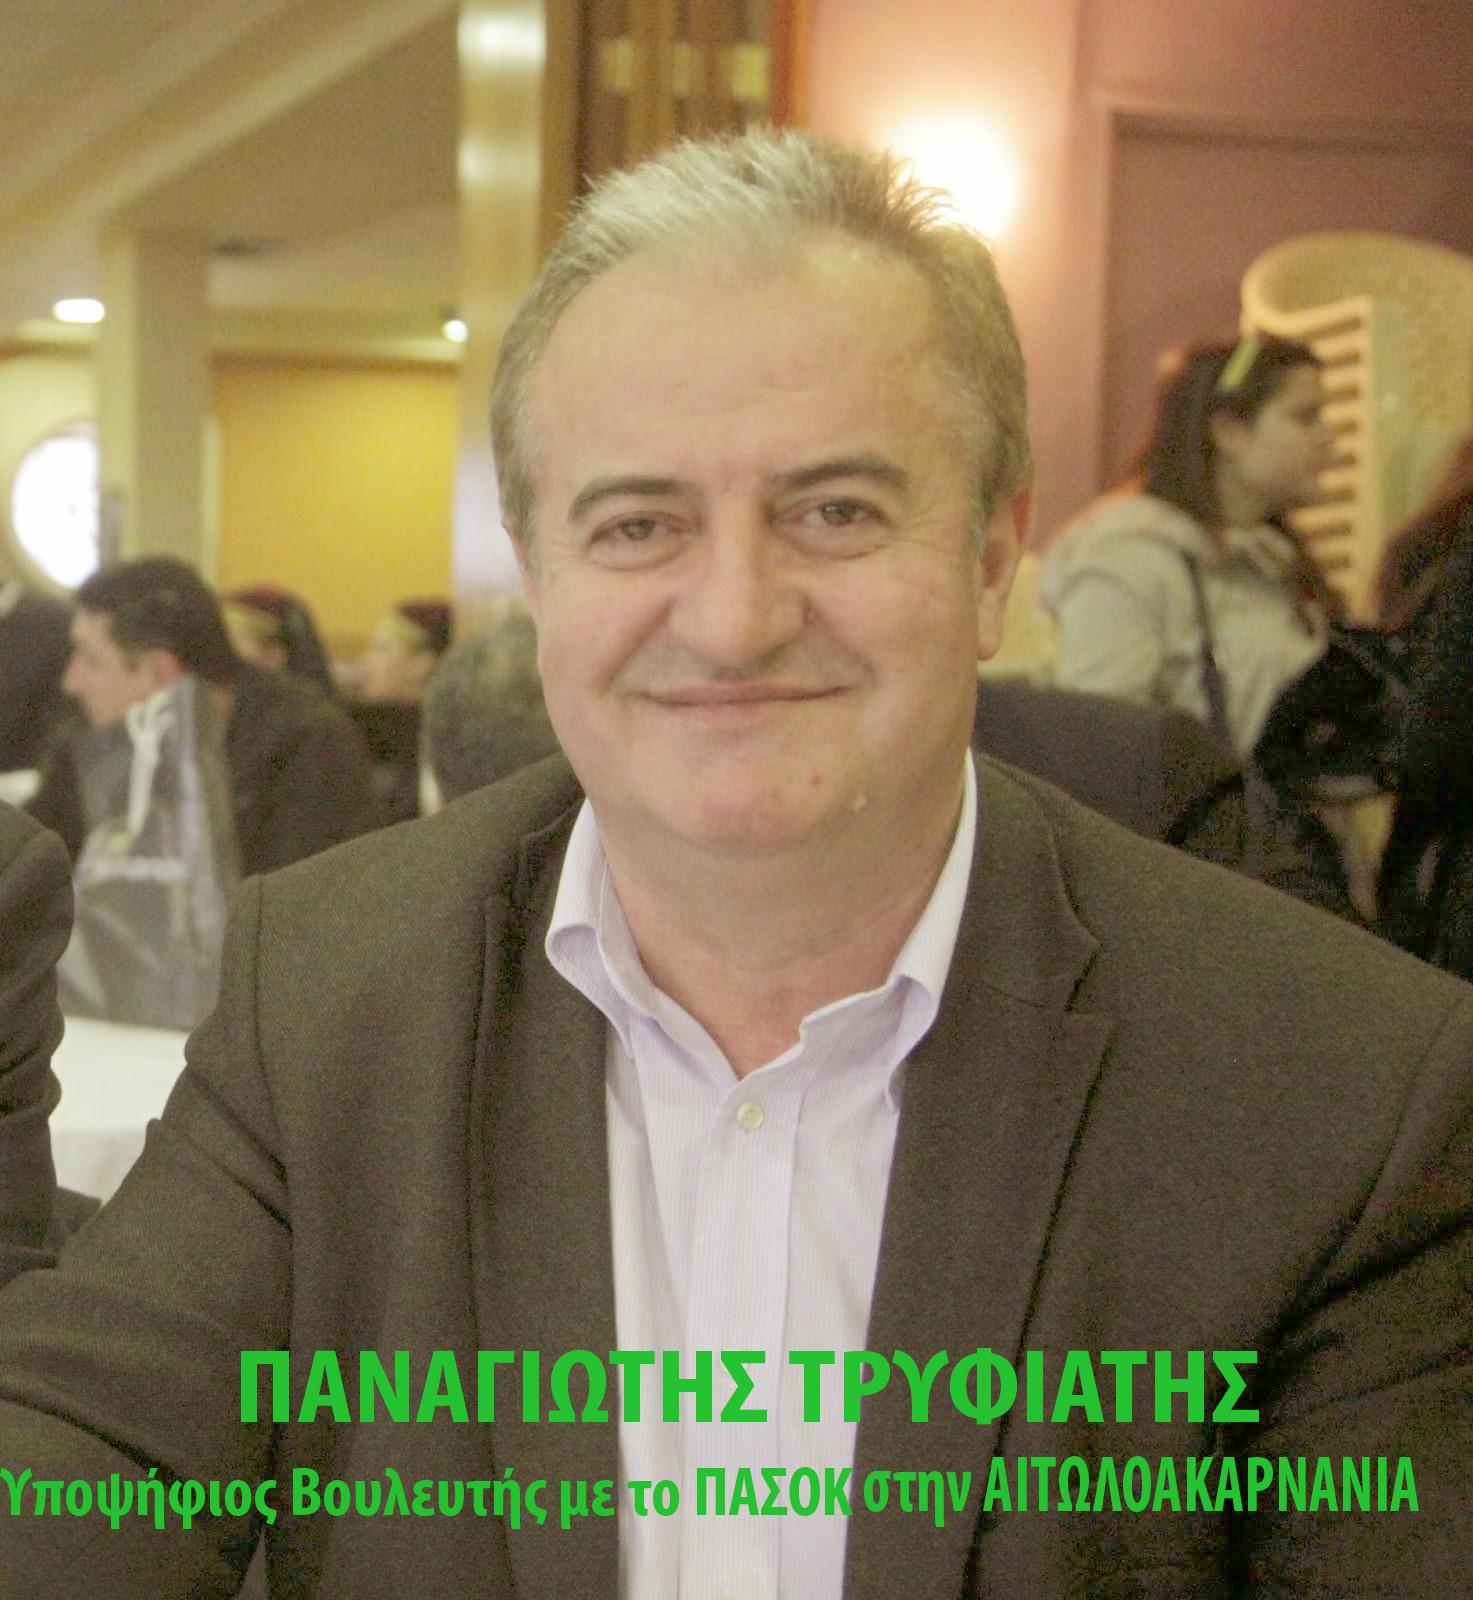 TRYFIATHS PANOS 2